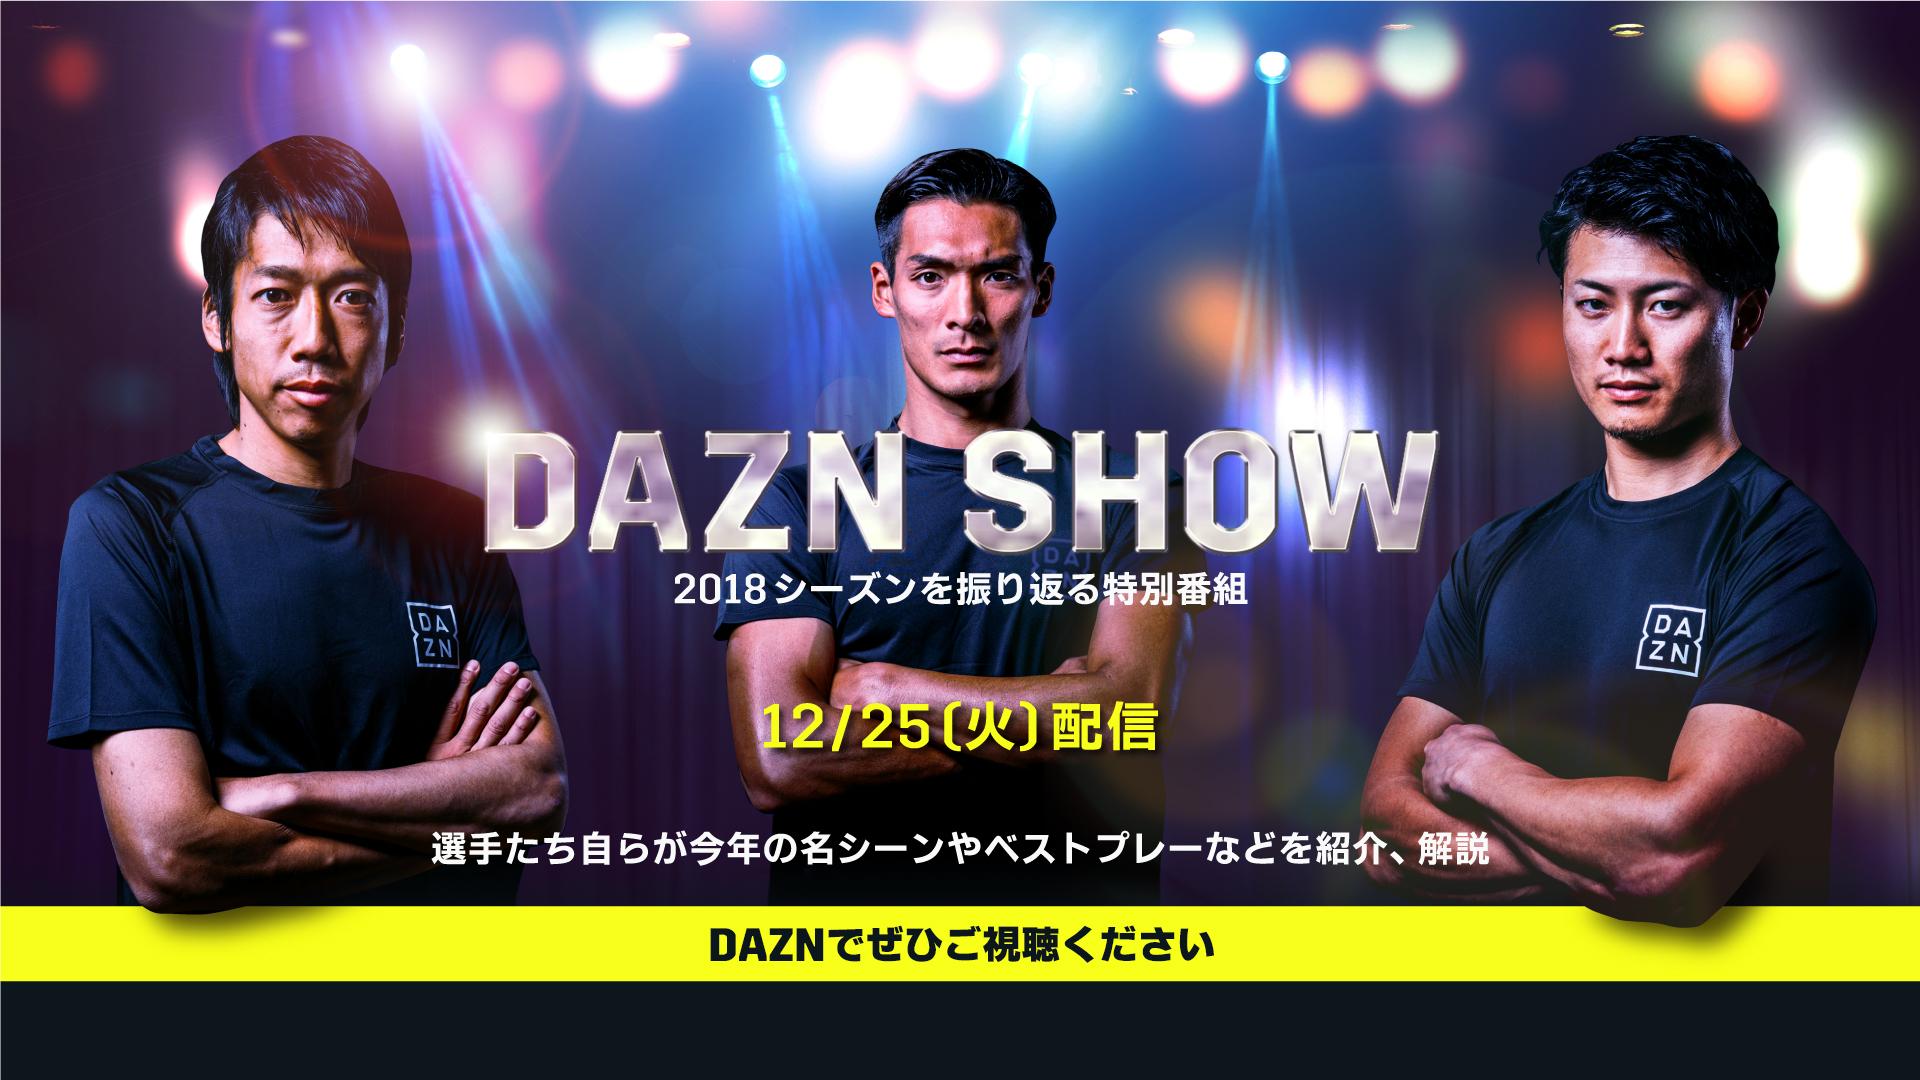 12月25日(火)配信 <br>DAZN「DAZN SHOW」